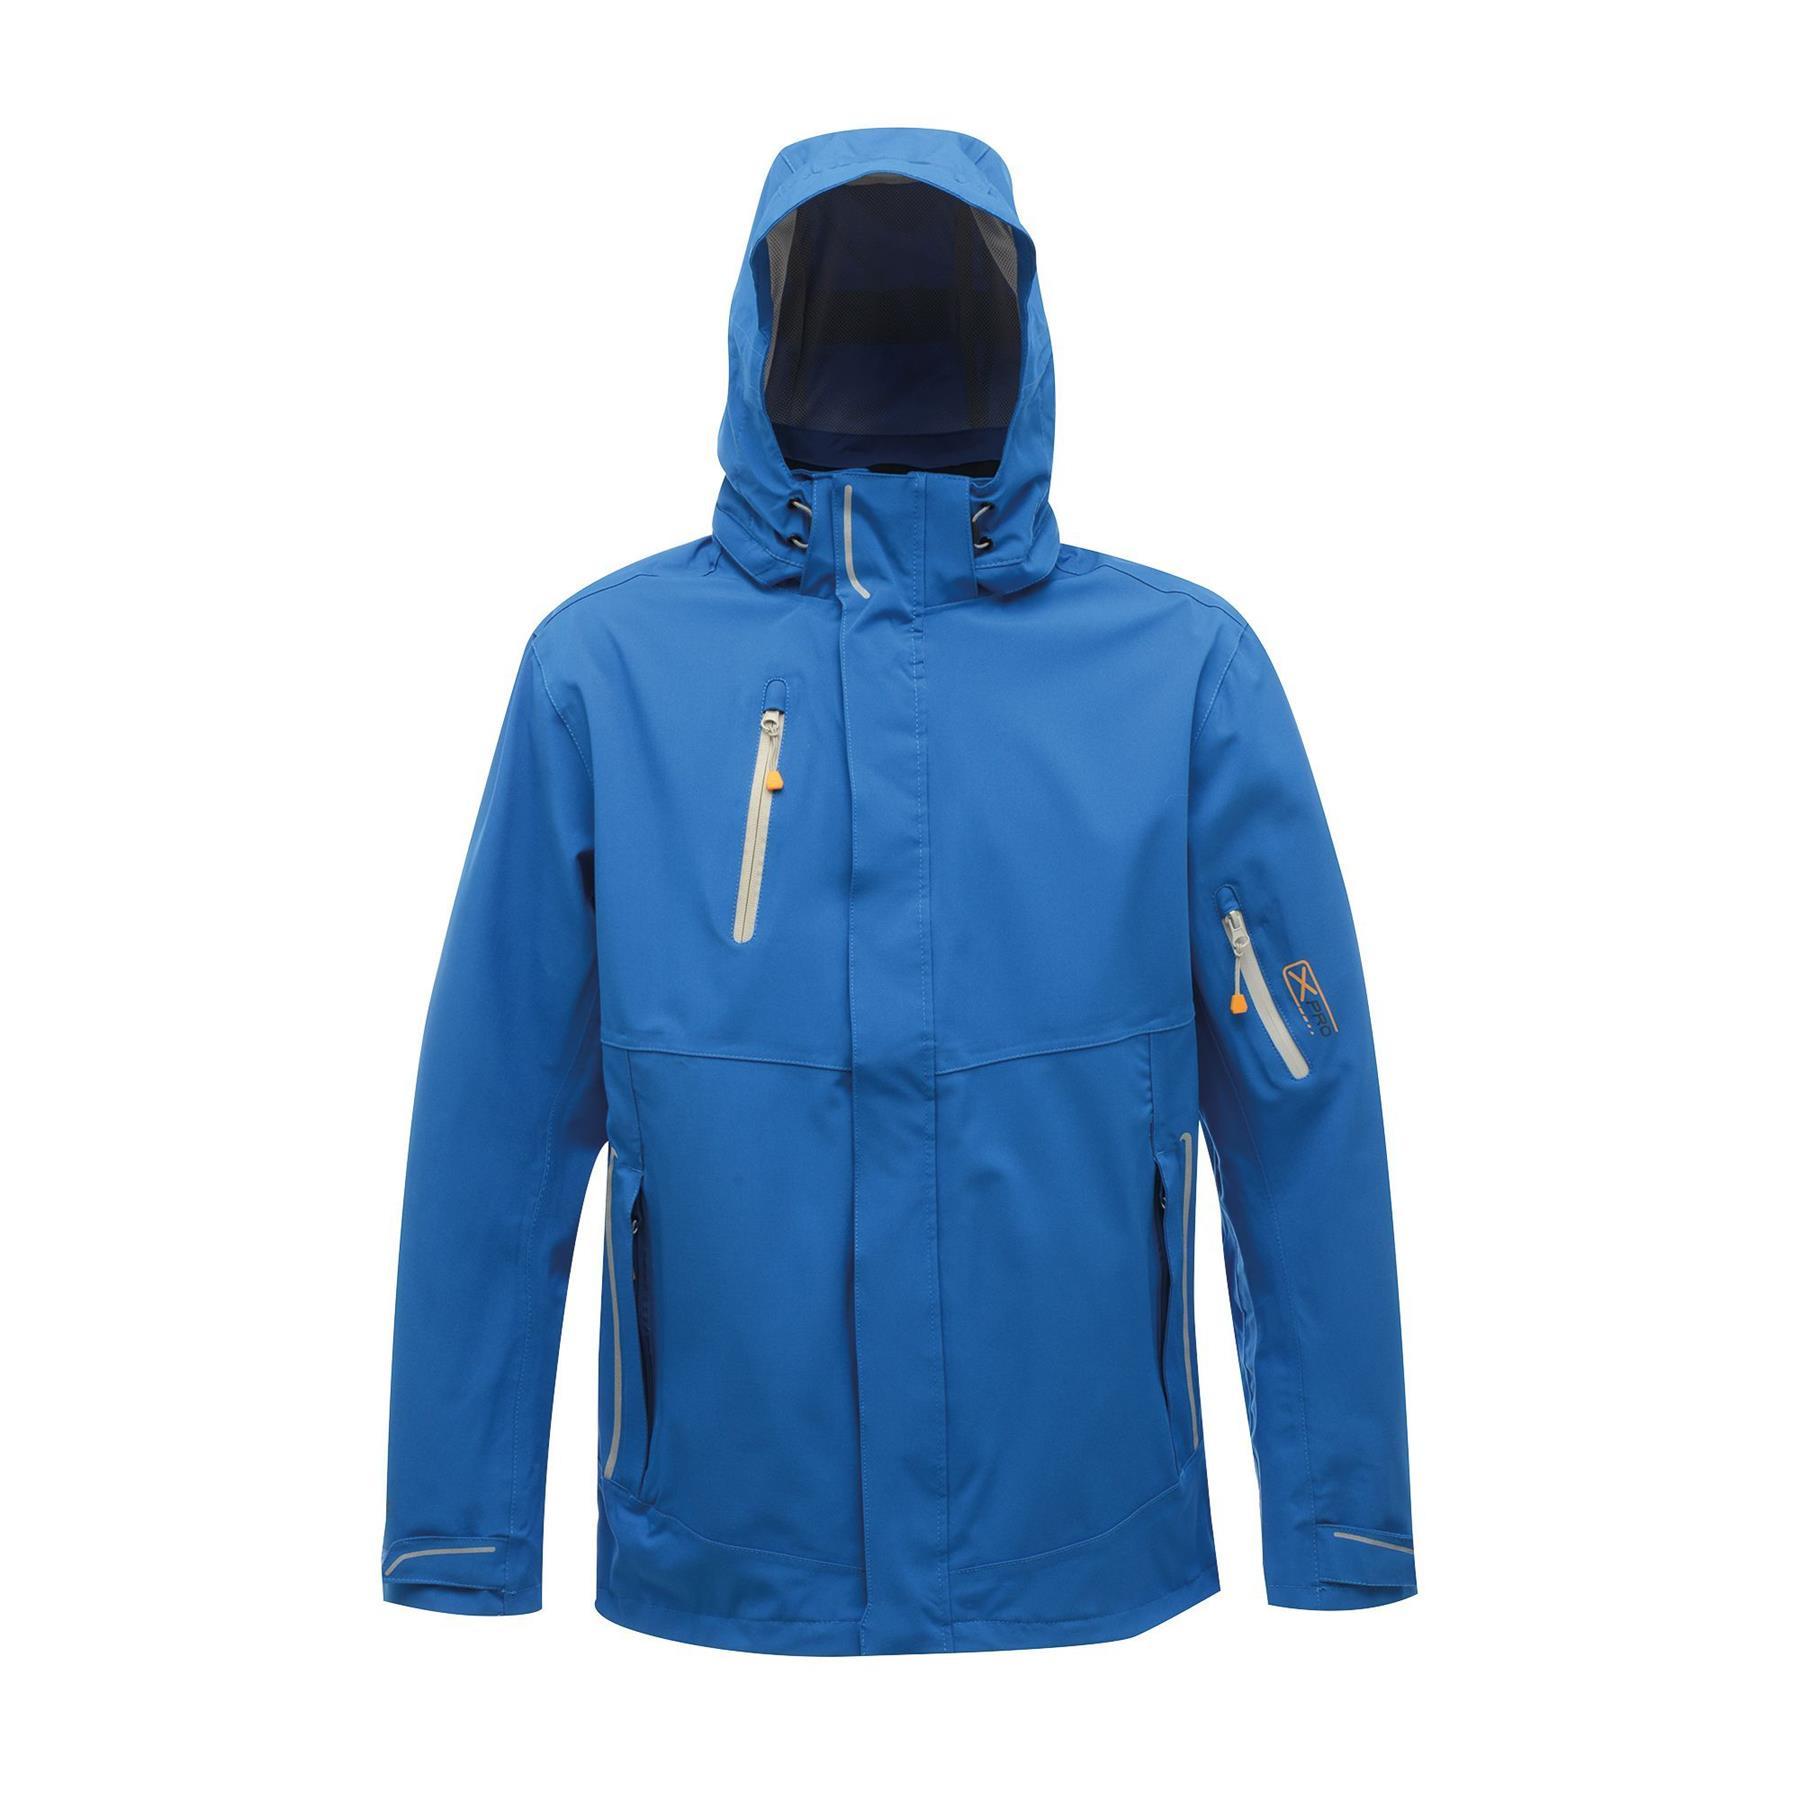 miniatuur 10 - Regatta Mens X-Pro Exosphere Stretch Waterproof Hooded Jacket